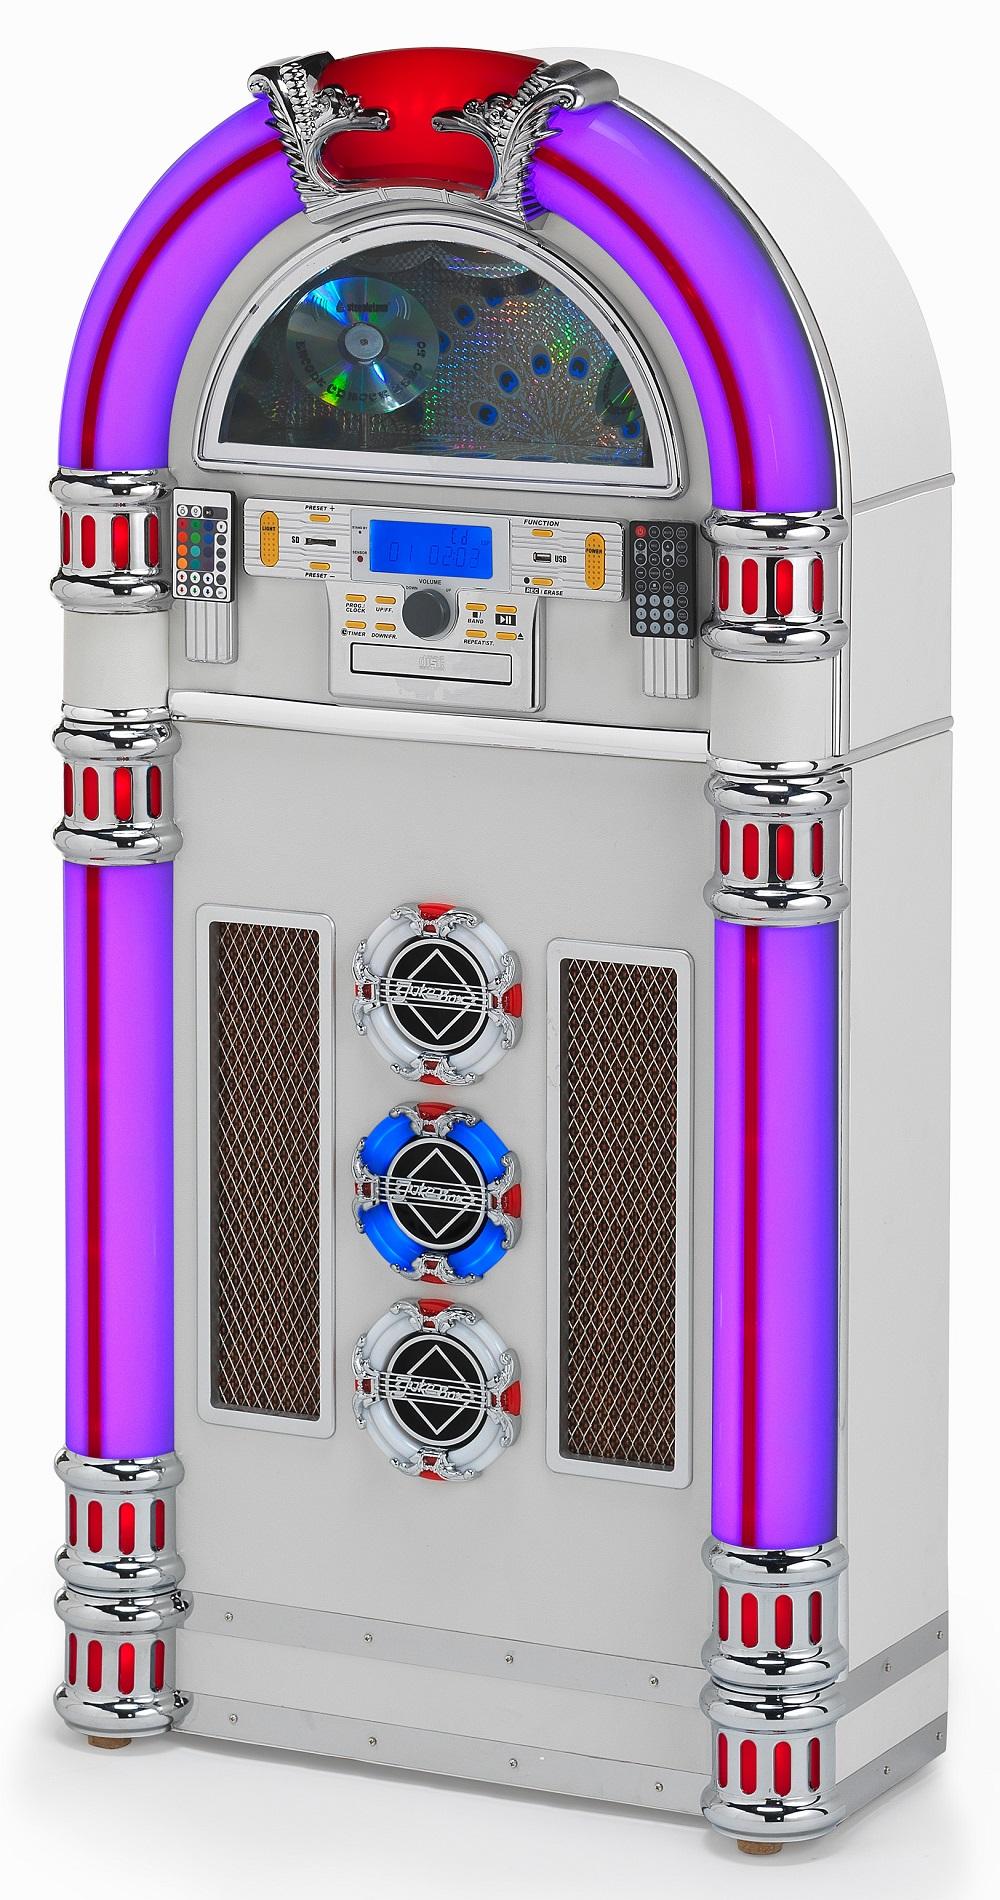 Pop software pop ipod jukebox v1 00 winall neox keygen zip